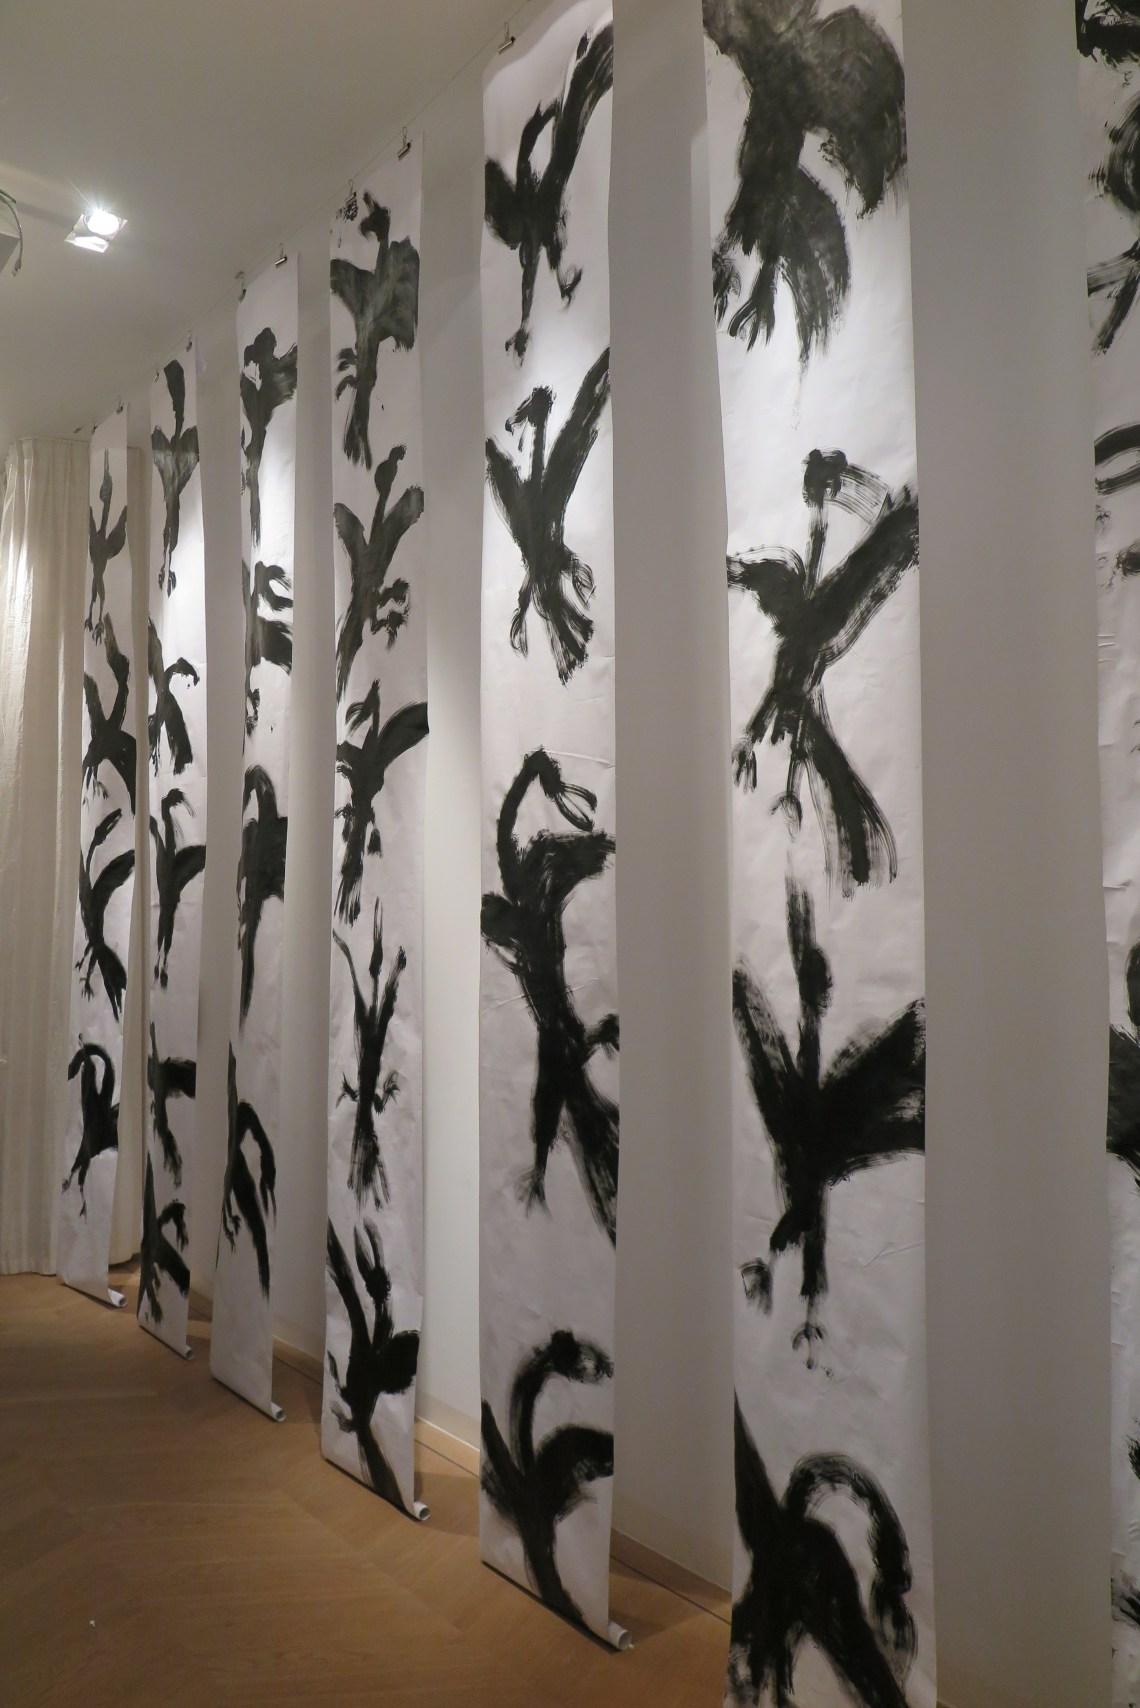 Judit Reigl - Oiseaux series - 2012